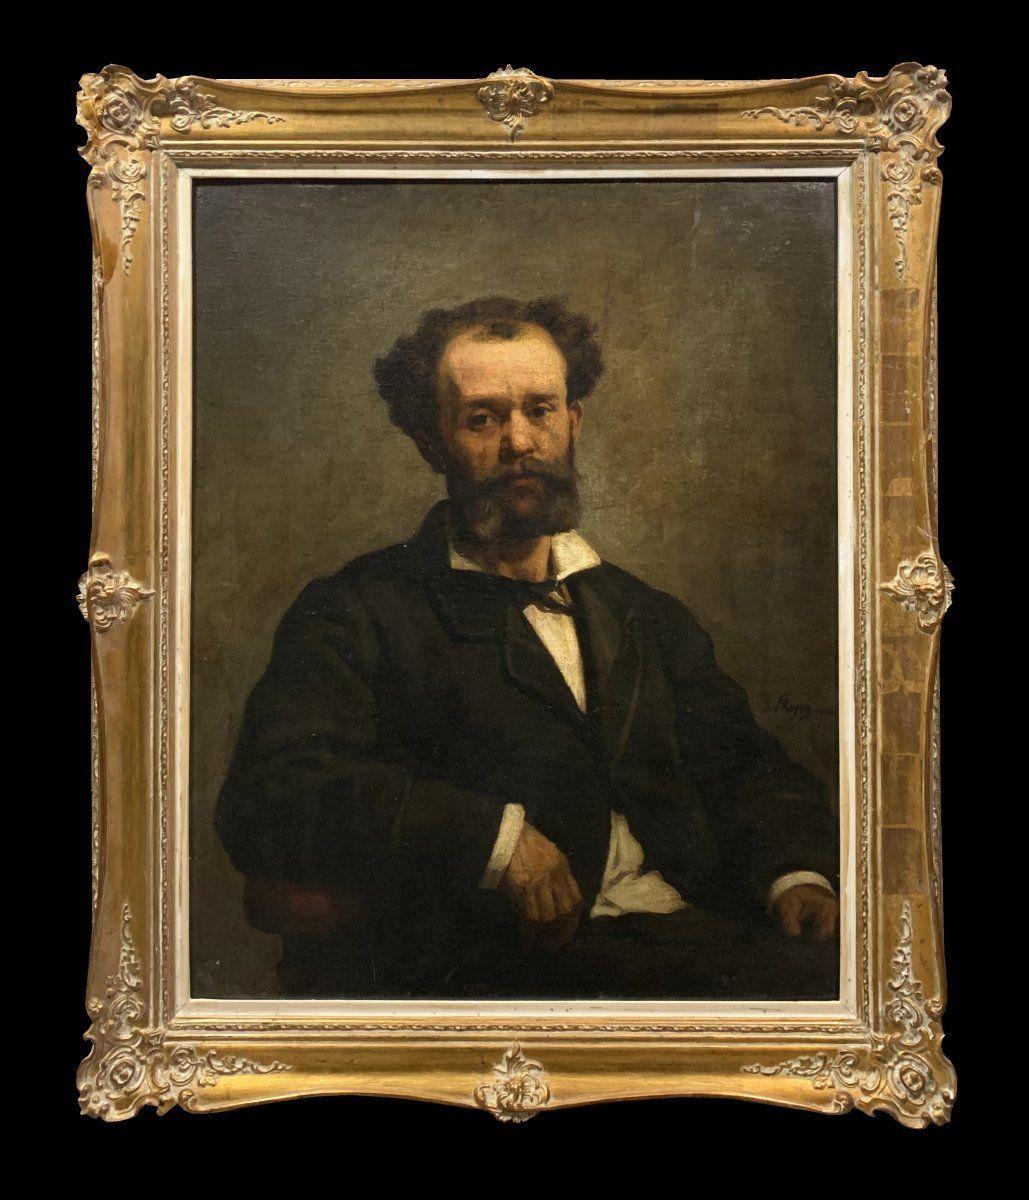 Edouard Moyse (1827-1908) - Ritratto di un ebreo belga